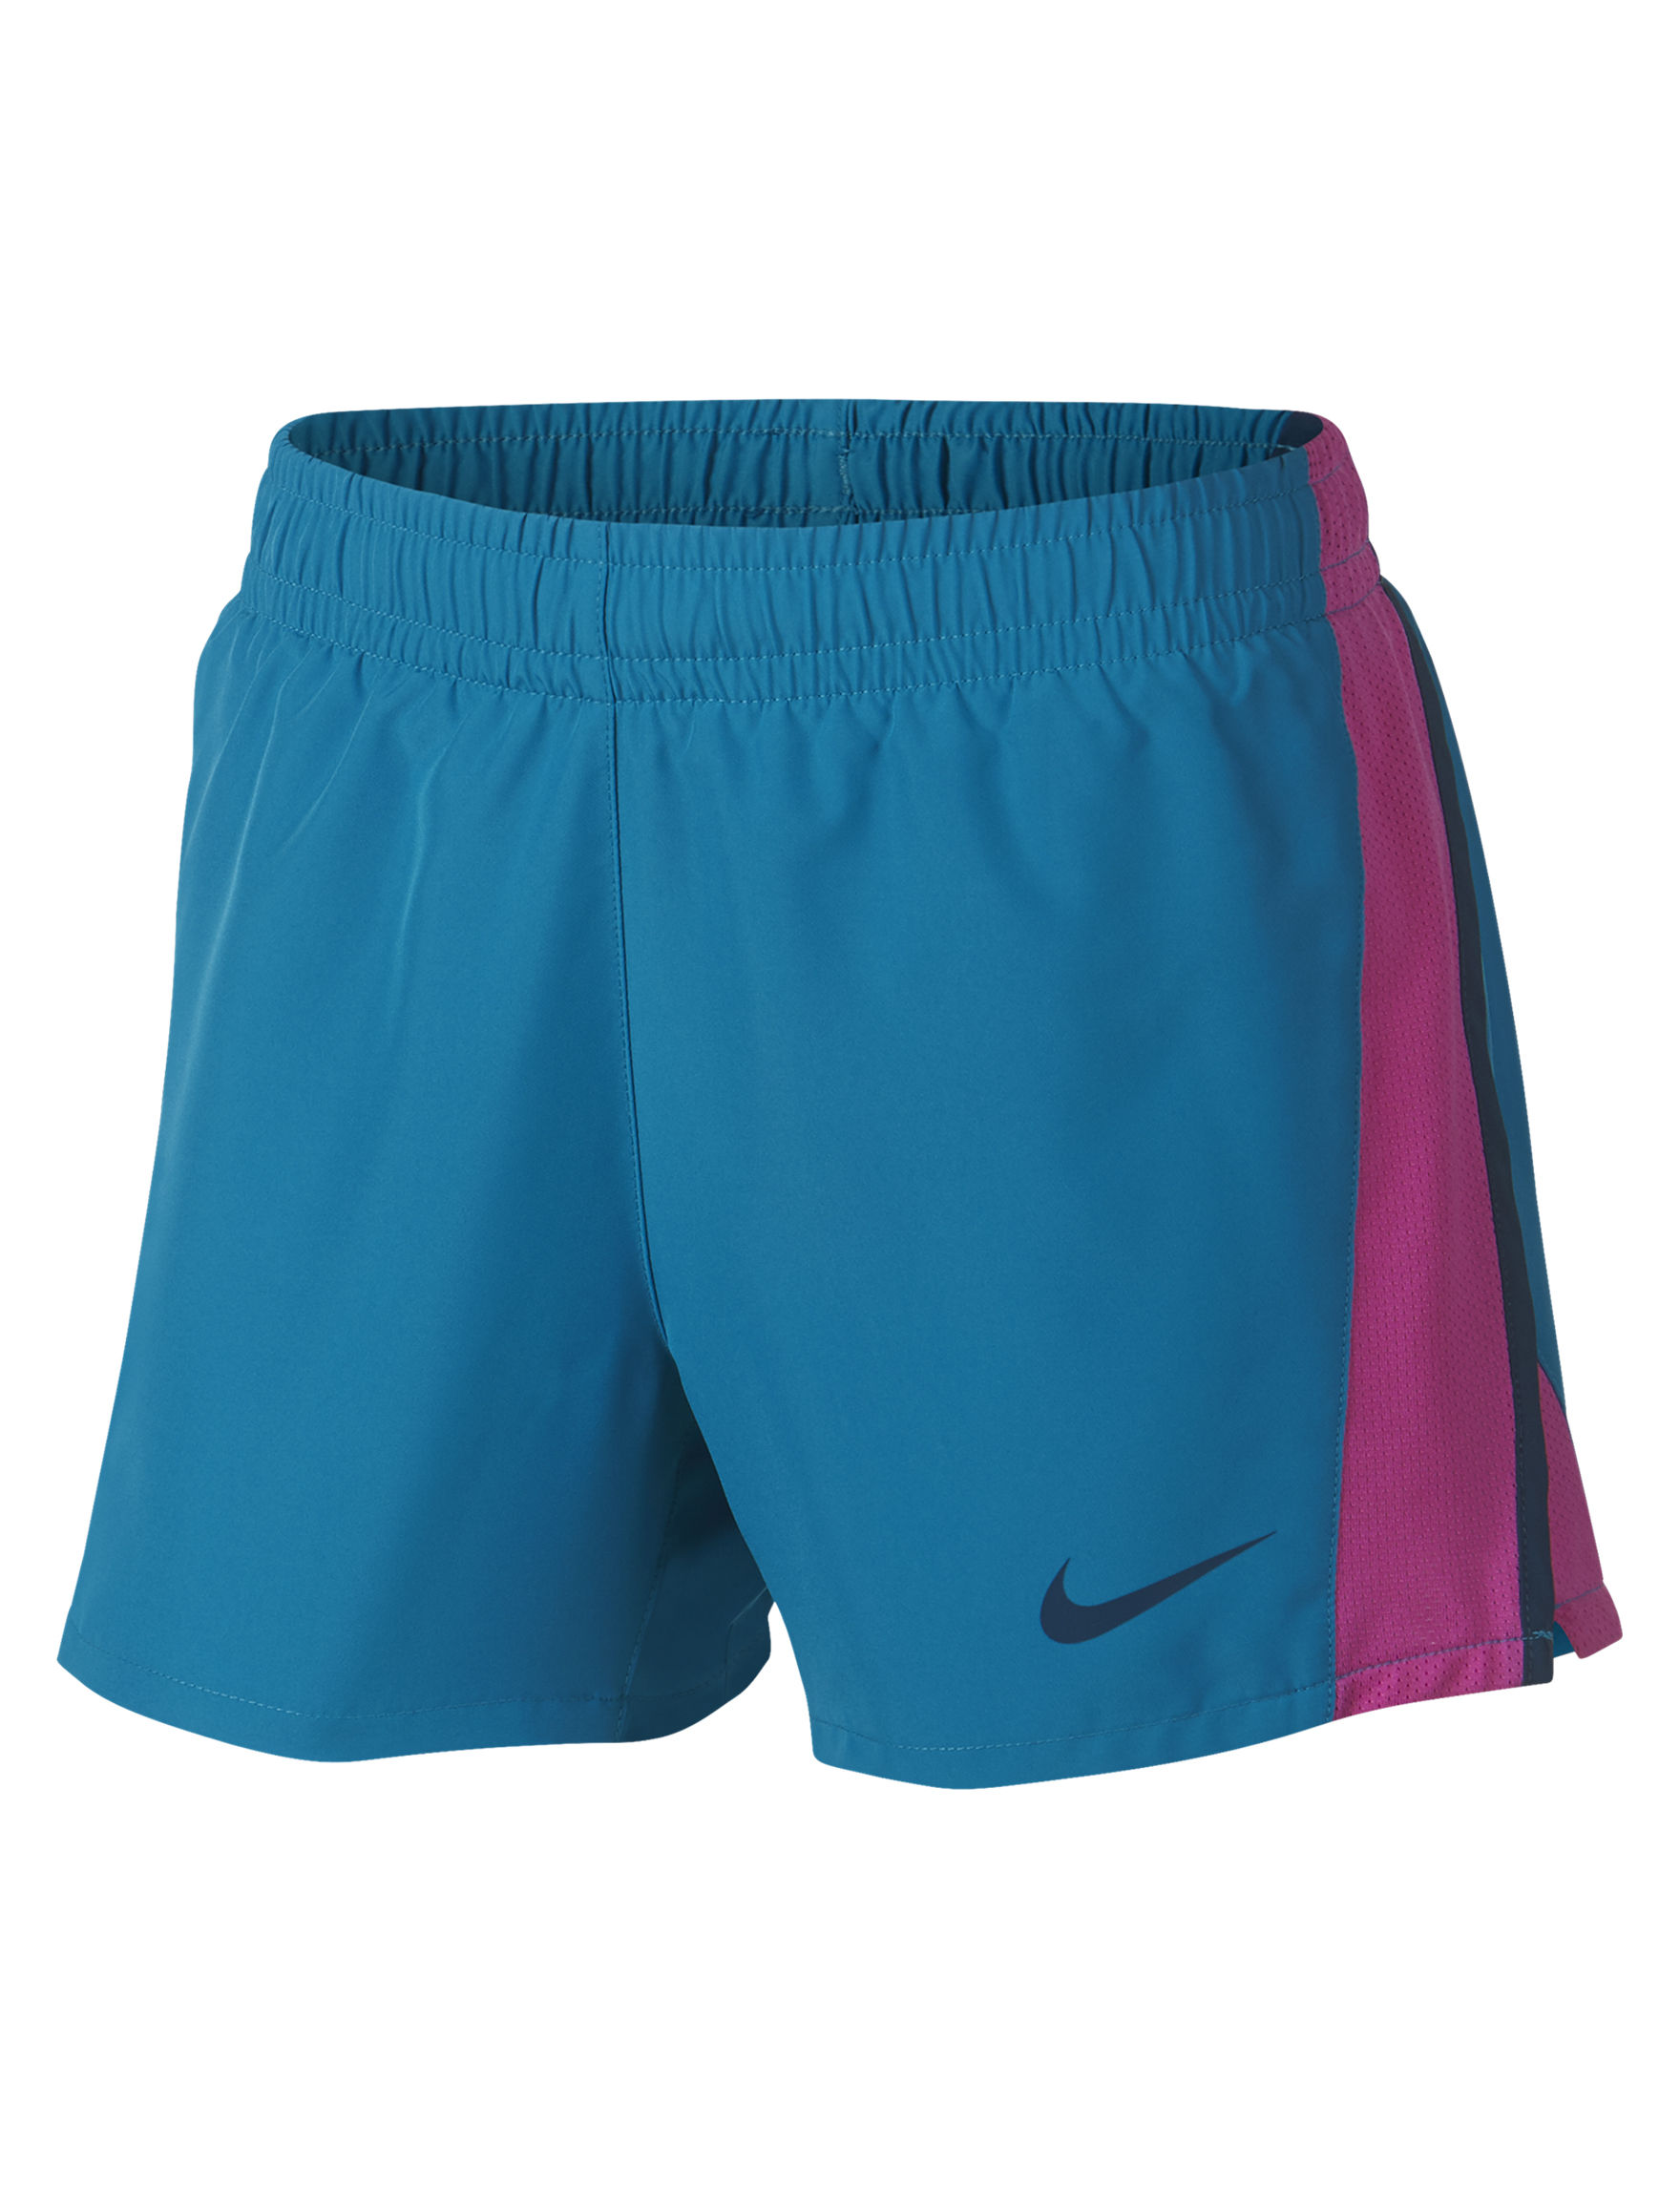 promo code 6b9bd 62411 Nike Dry Running Shorts - Girls 7-16   Stage Stores